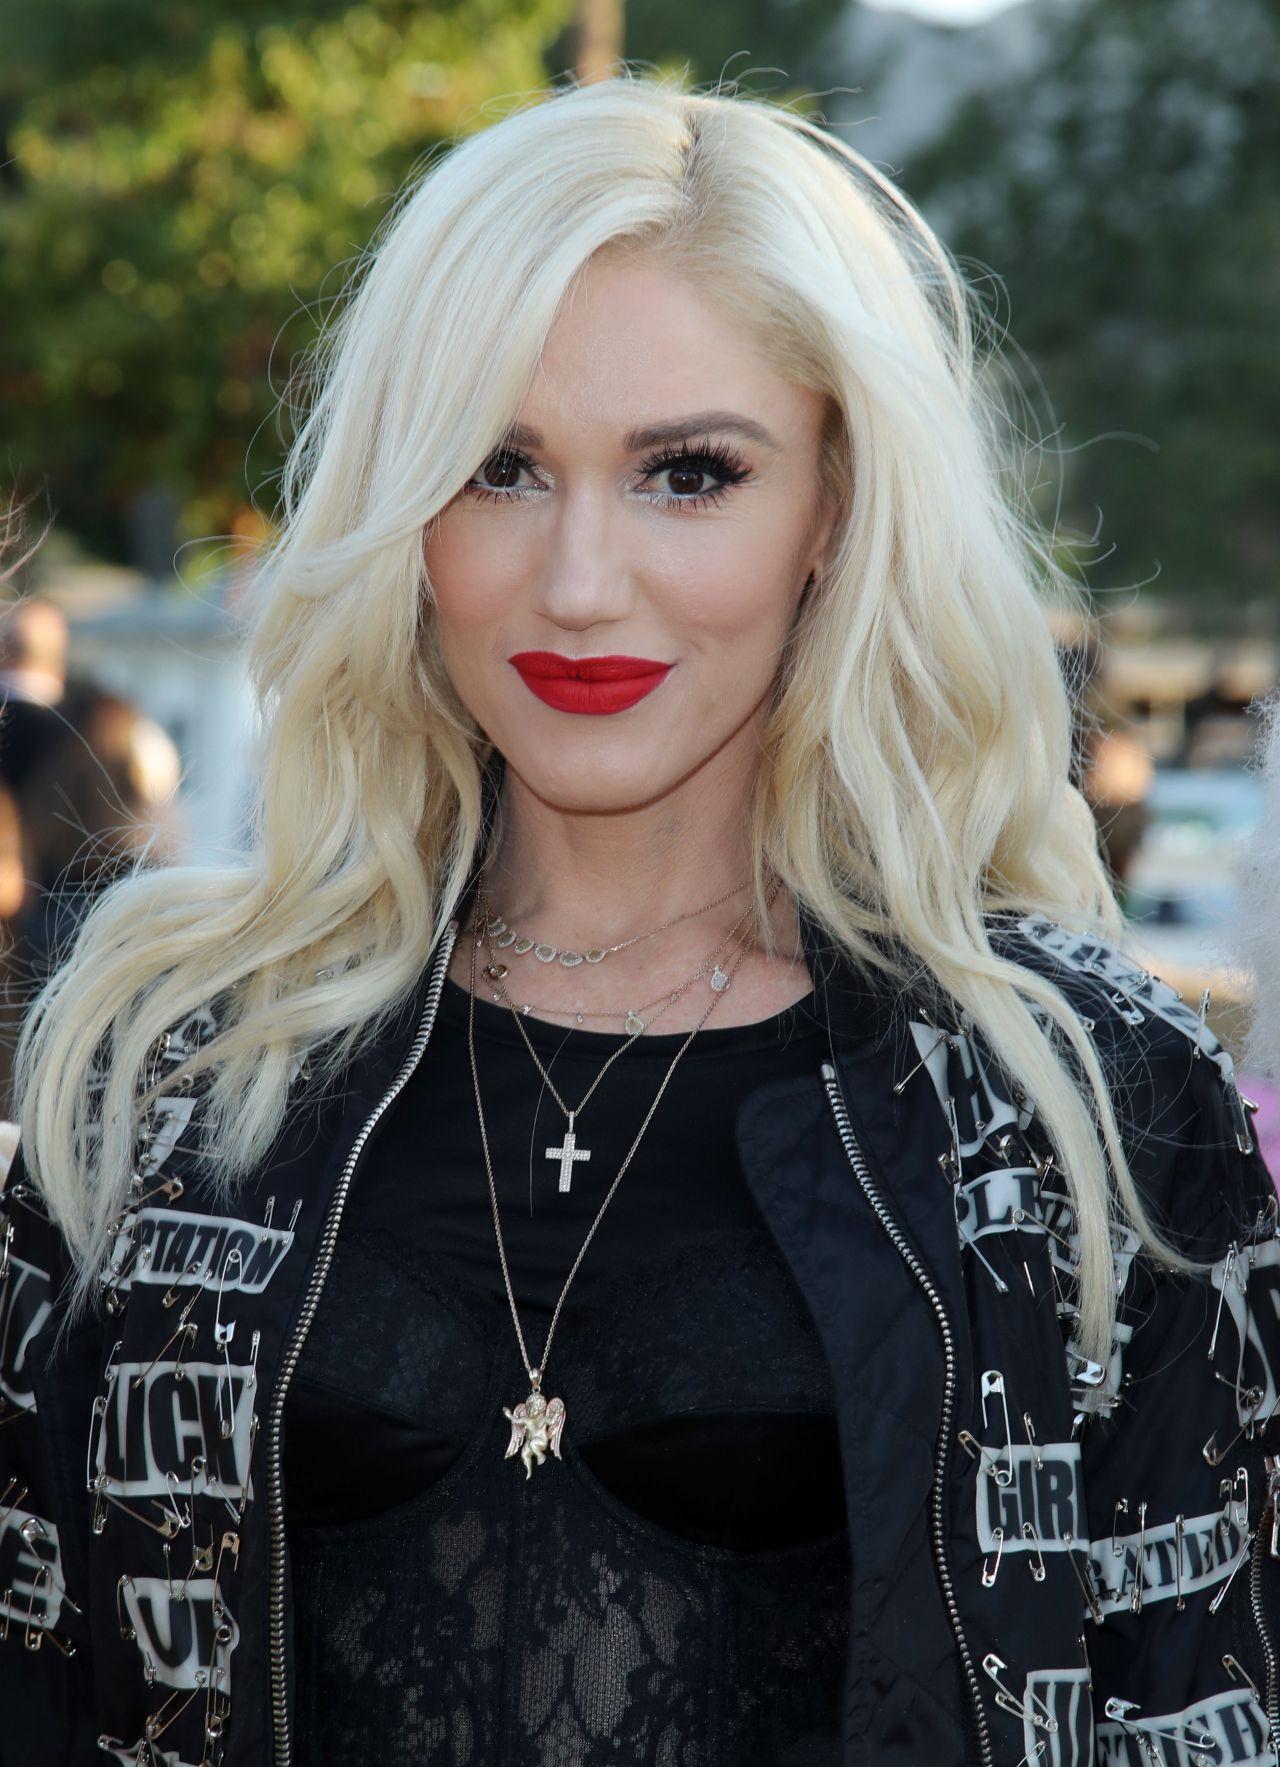 Gwen Stefani Latest Photos - CelebMafia гвен стефани 2018